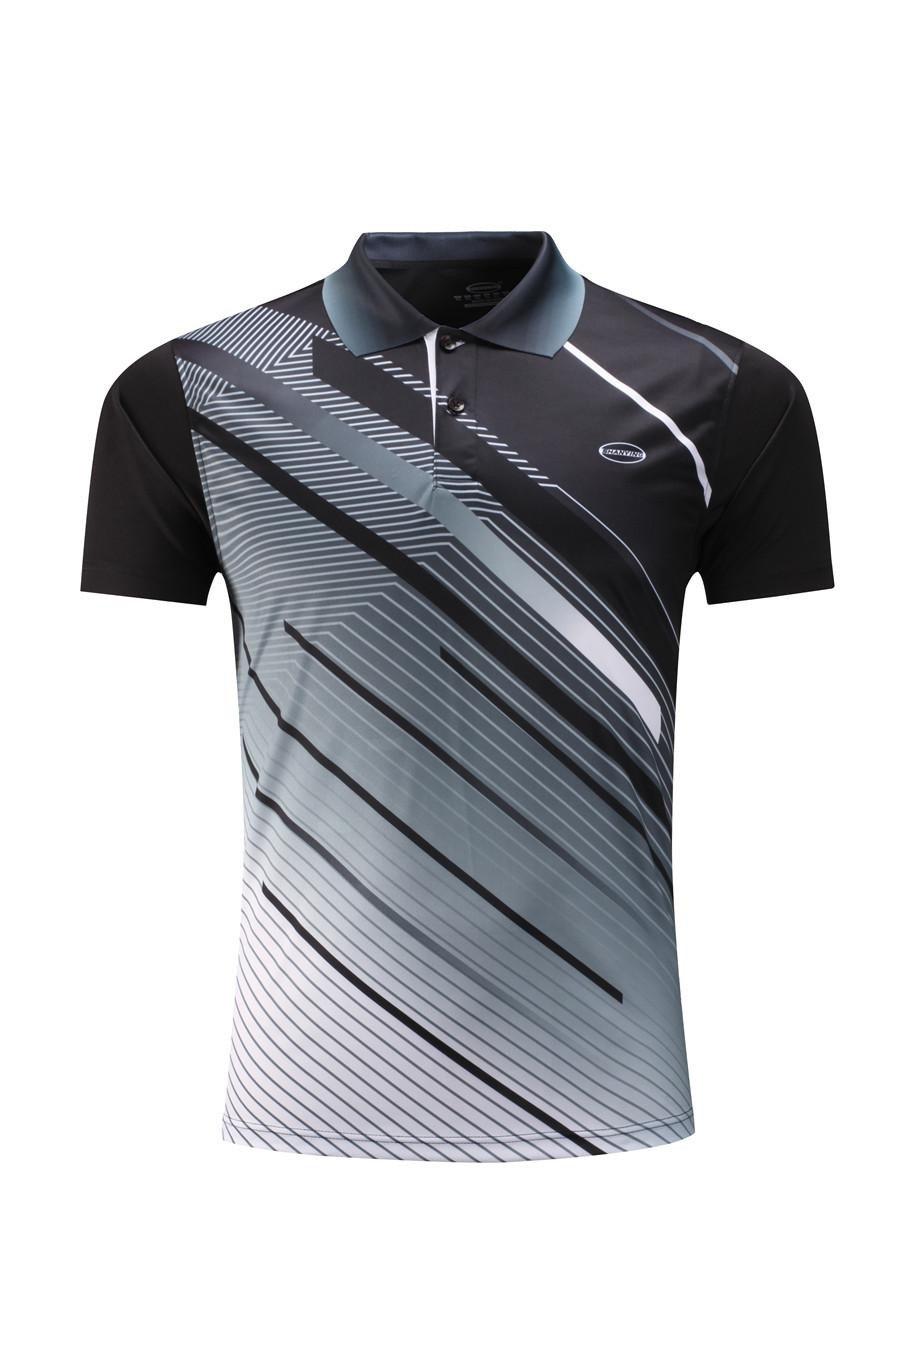 22++ Buy golf shirts online info